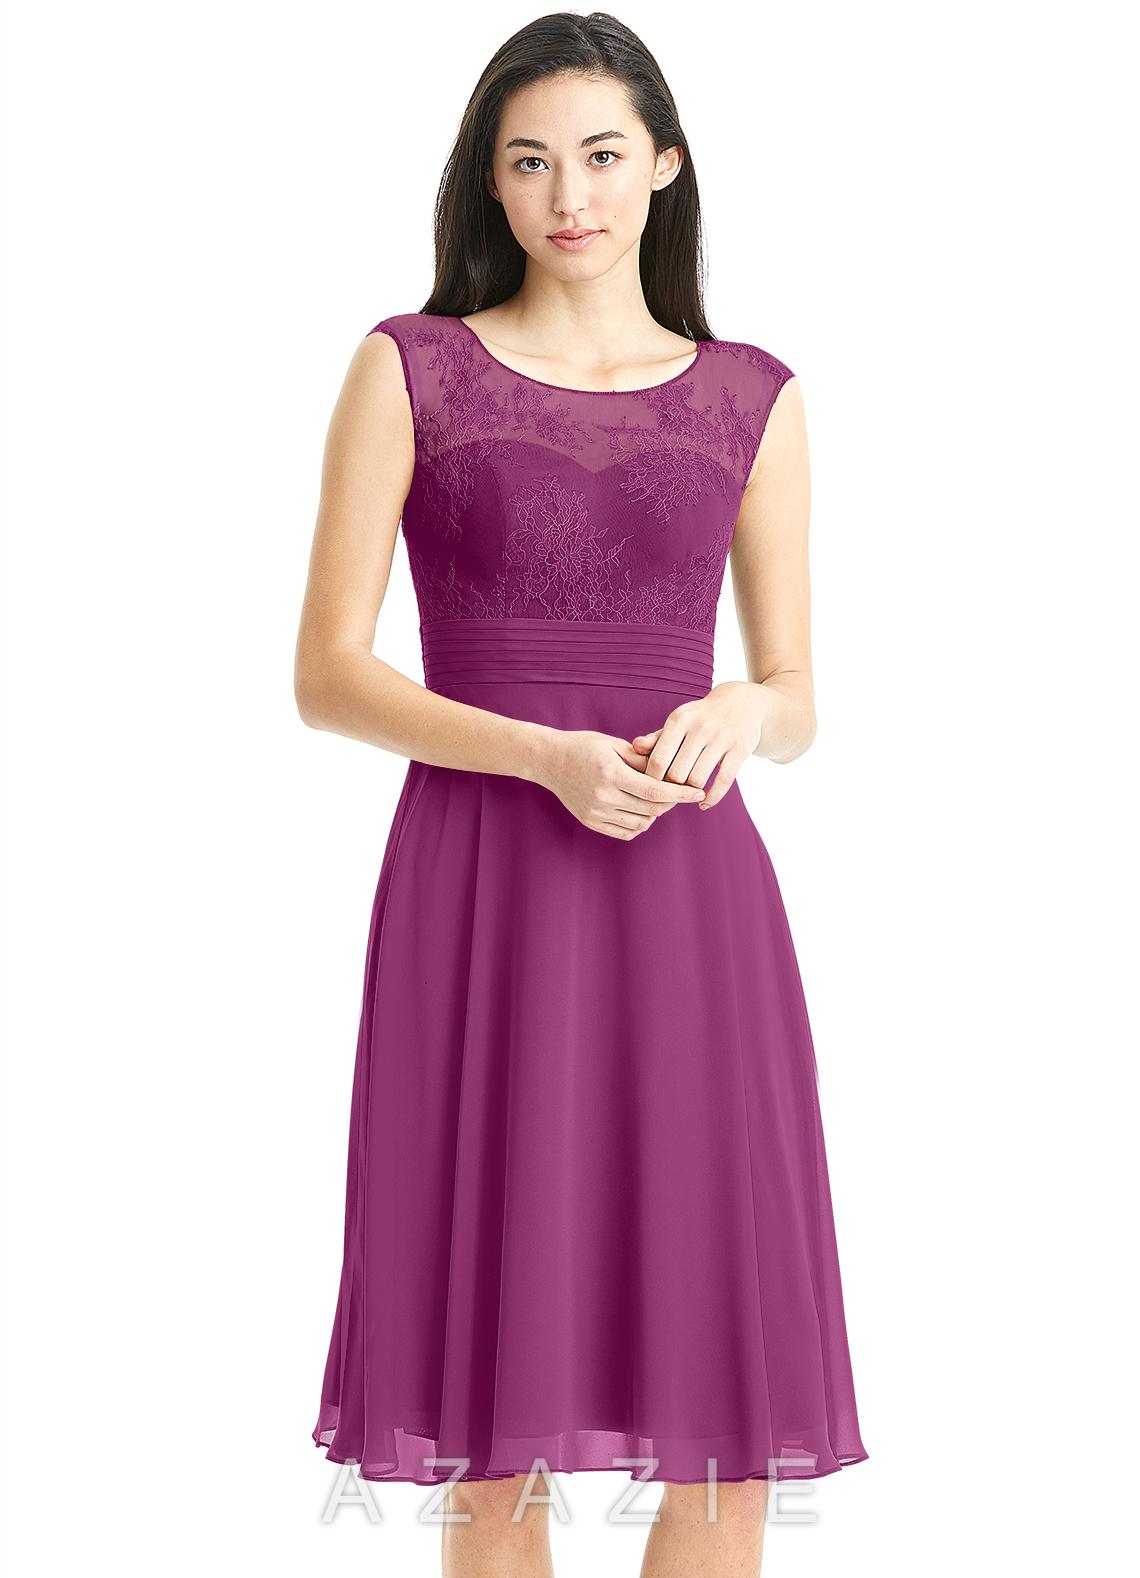 Azazie missy bridesmaid dress azazie home bridesmaid dresses azazie missy azazie missy loading zoom ombrellifo Images